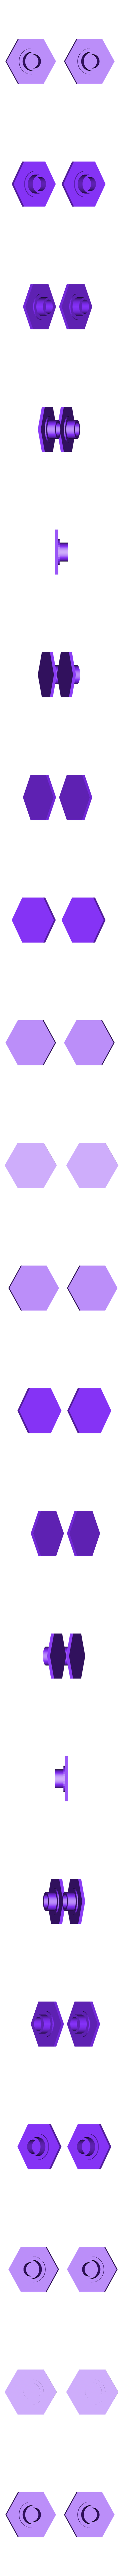 Example_608ZZ_6_Parametric_Fidget_Spinner_Cap.stl Download free STL file Customizable Fidget Spinner Cap • 3D printable design, MightyNozzle